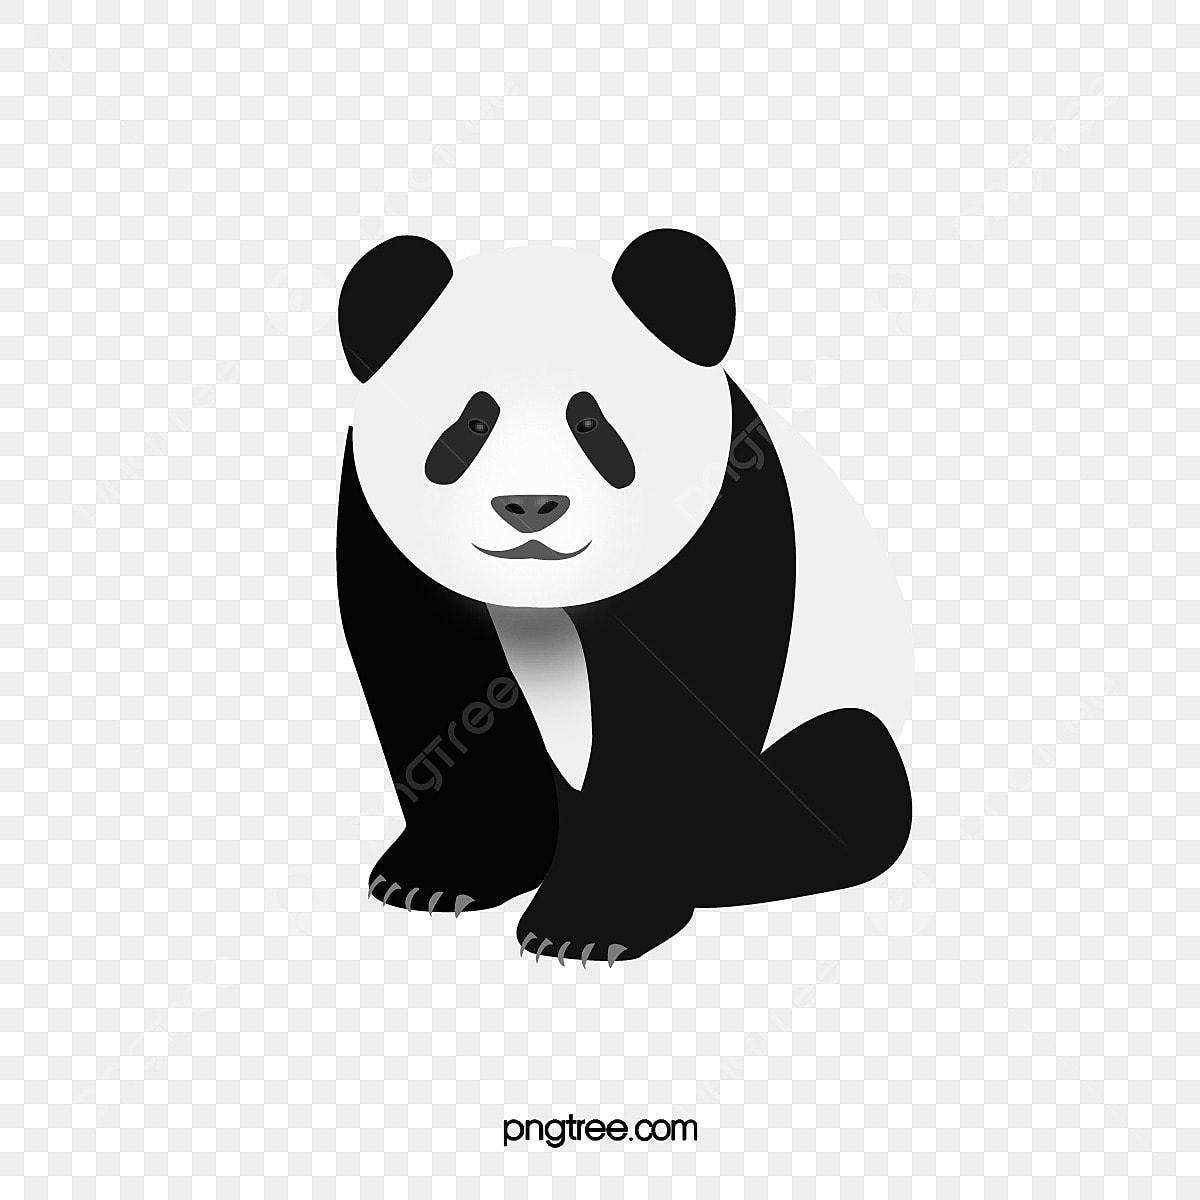 Free Panda Clipart Panda Clipart Images Panda Face - Panda Stencil - Png  Download (#117964) - PinClipart